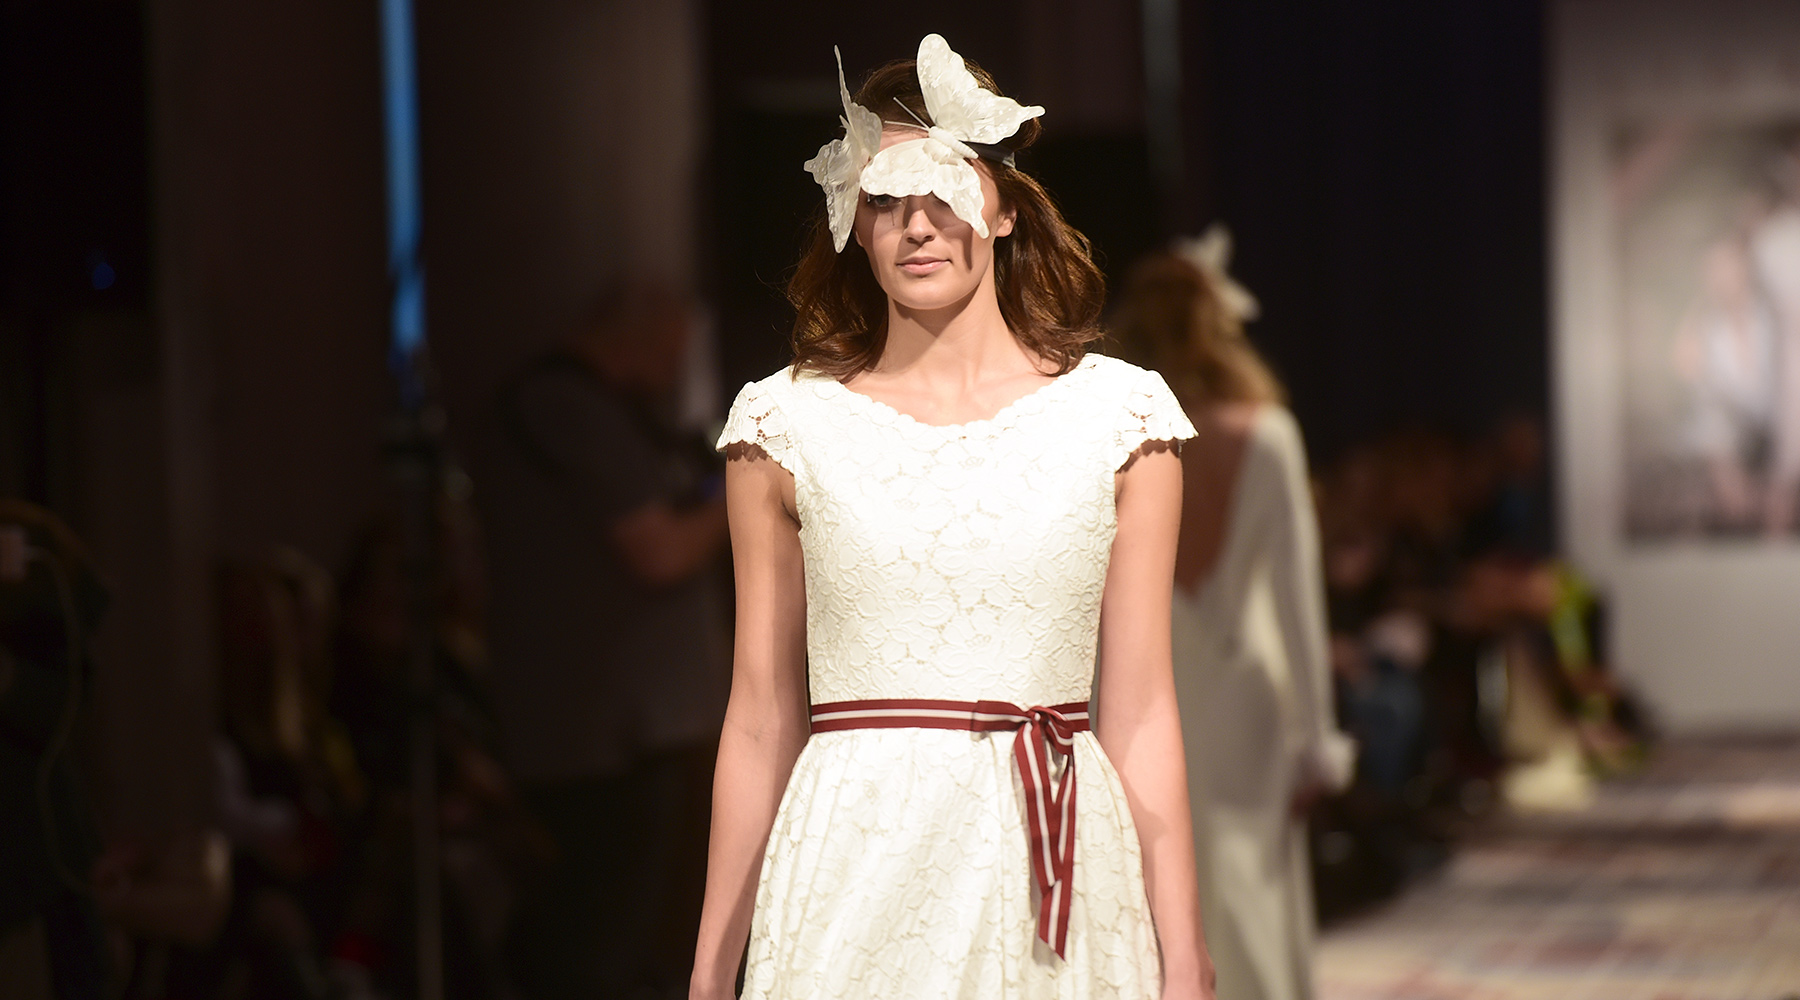 Amelia-wedding-dresses-143